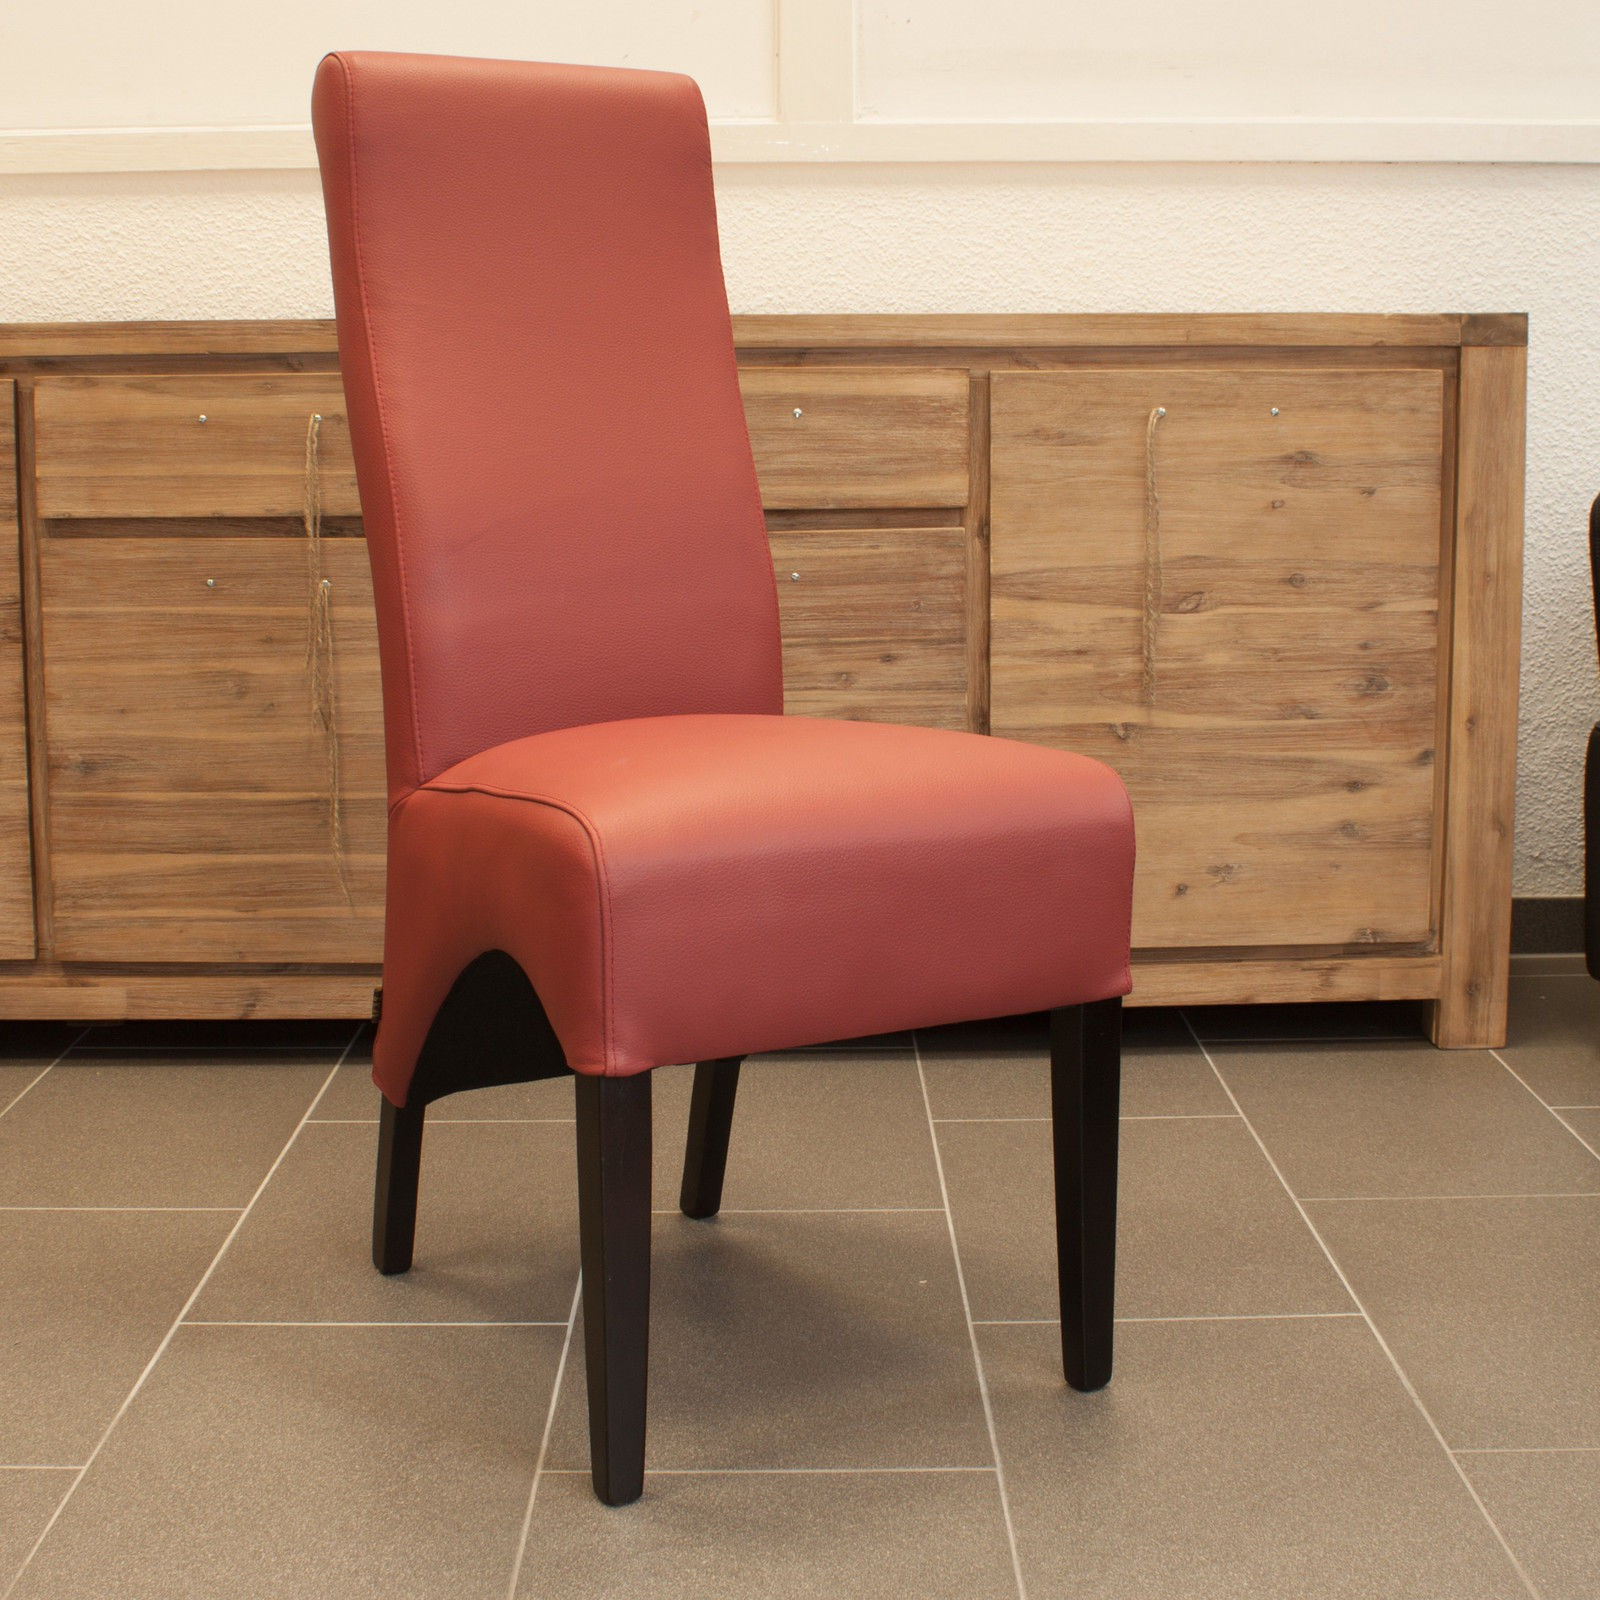 Lederstuhl Lederstühle Regina  Leder Rot ergonomischer ...